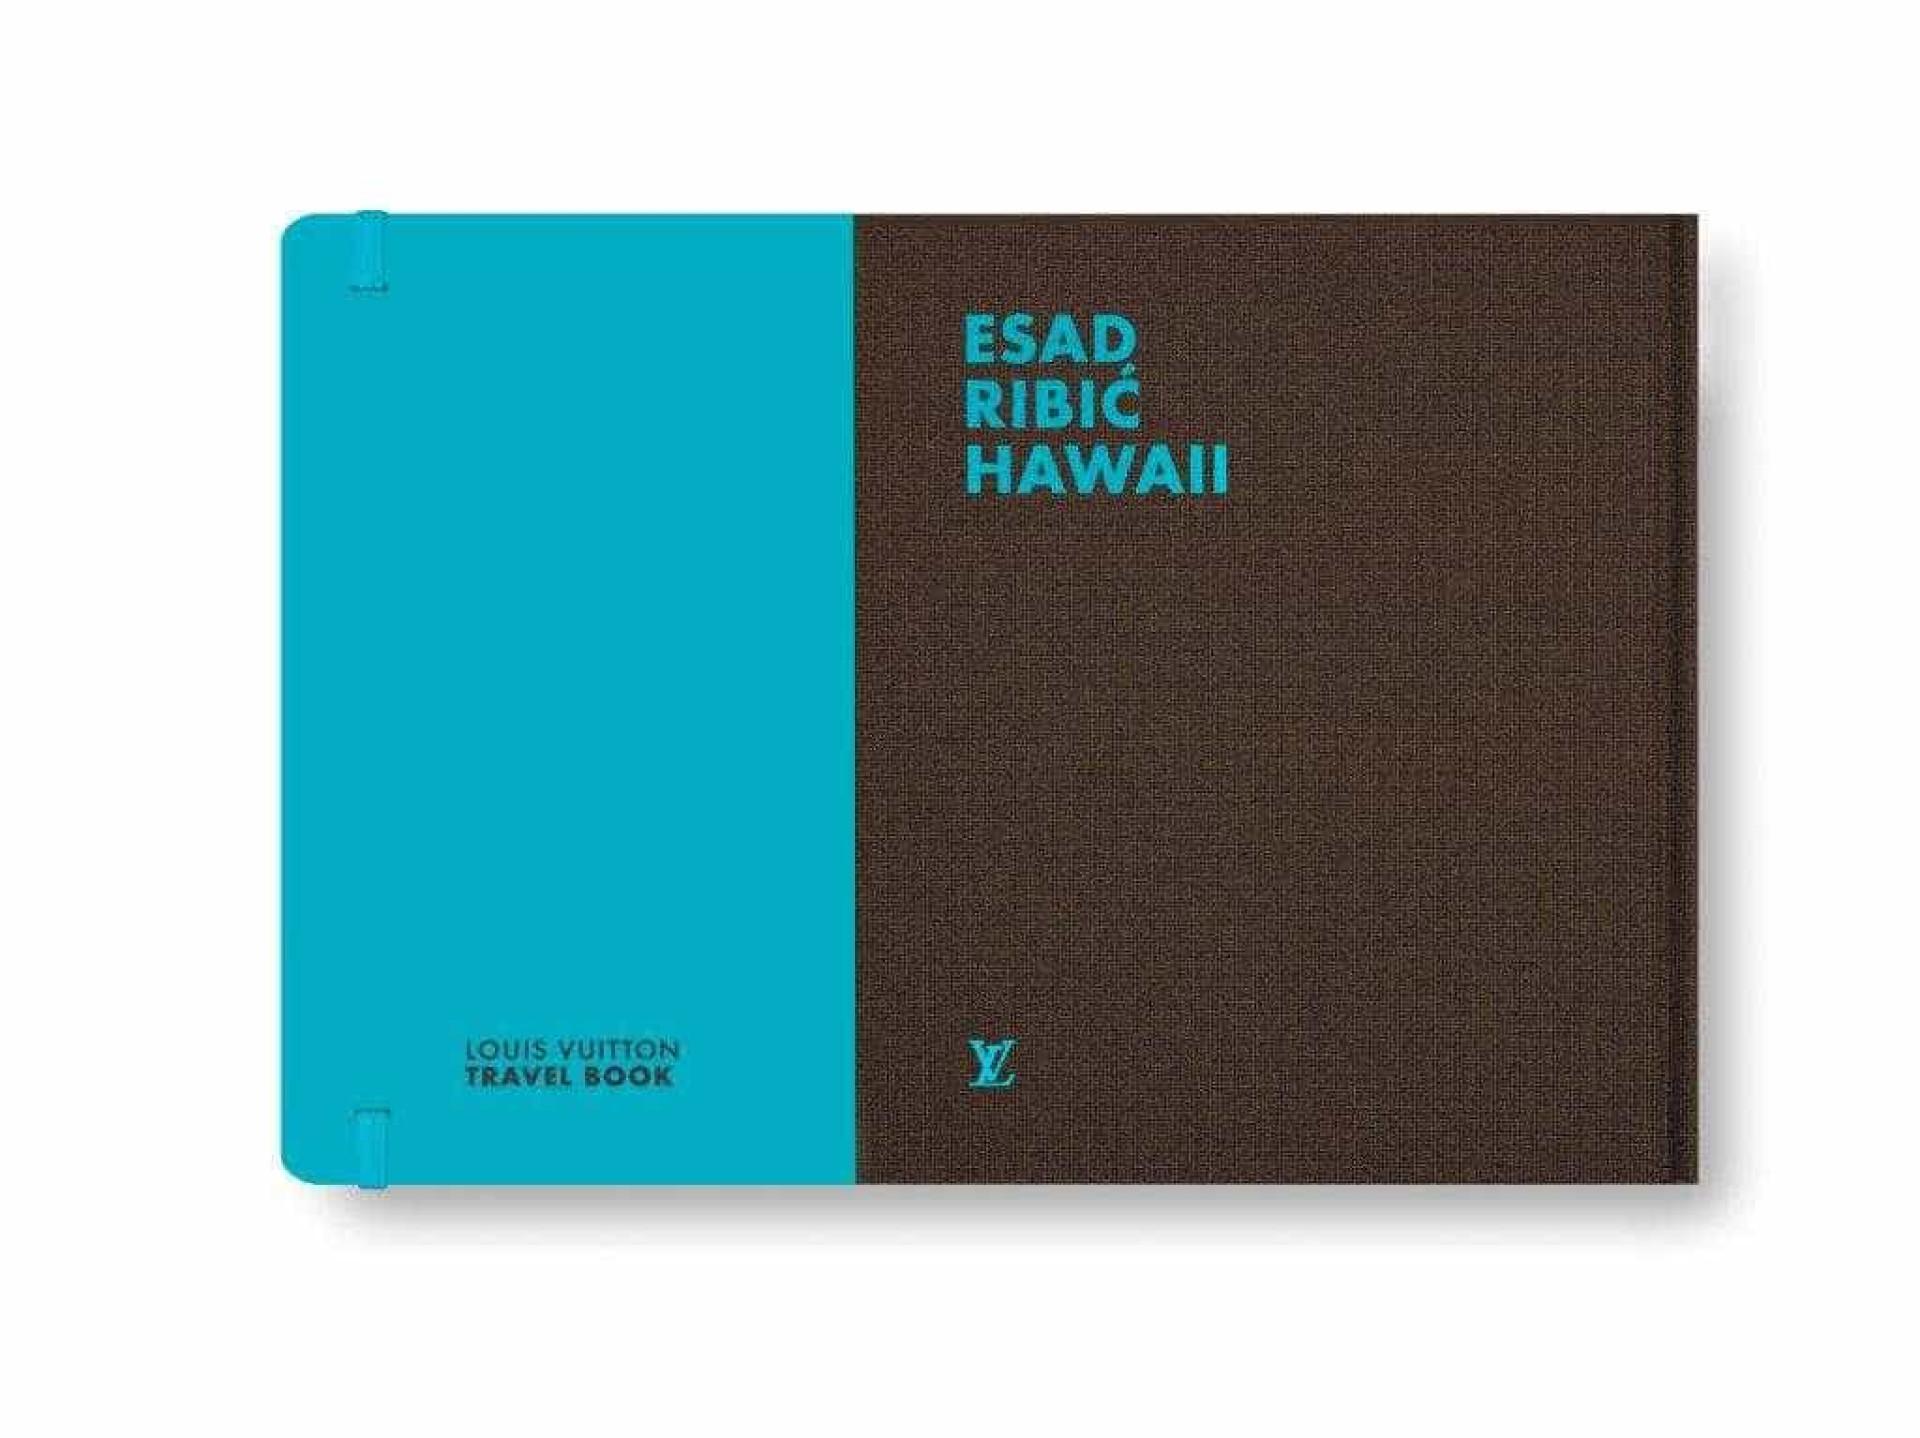 O Livro de Viagens da Louis Vuitton chega agora a Hawai, México e Tóquio